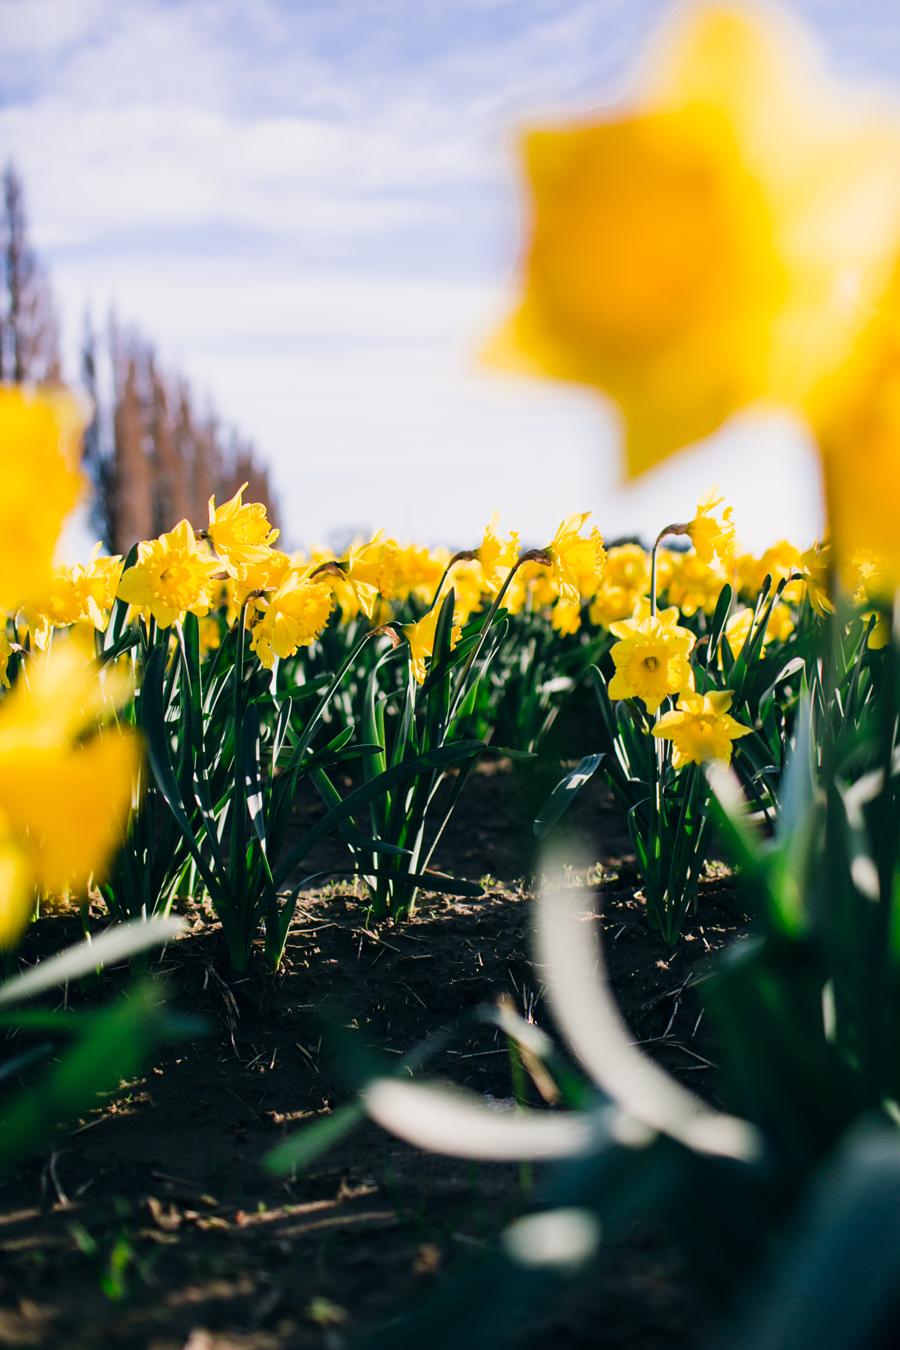 008-skagit-vallery-mount-vernon-washington-daffodils-tulip-festival-katheryn-moran-photography.jpg